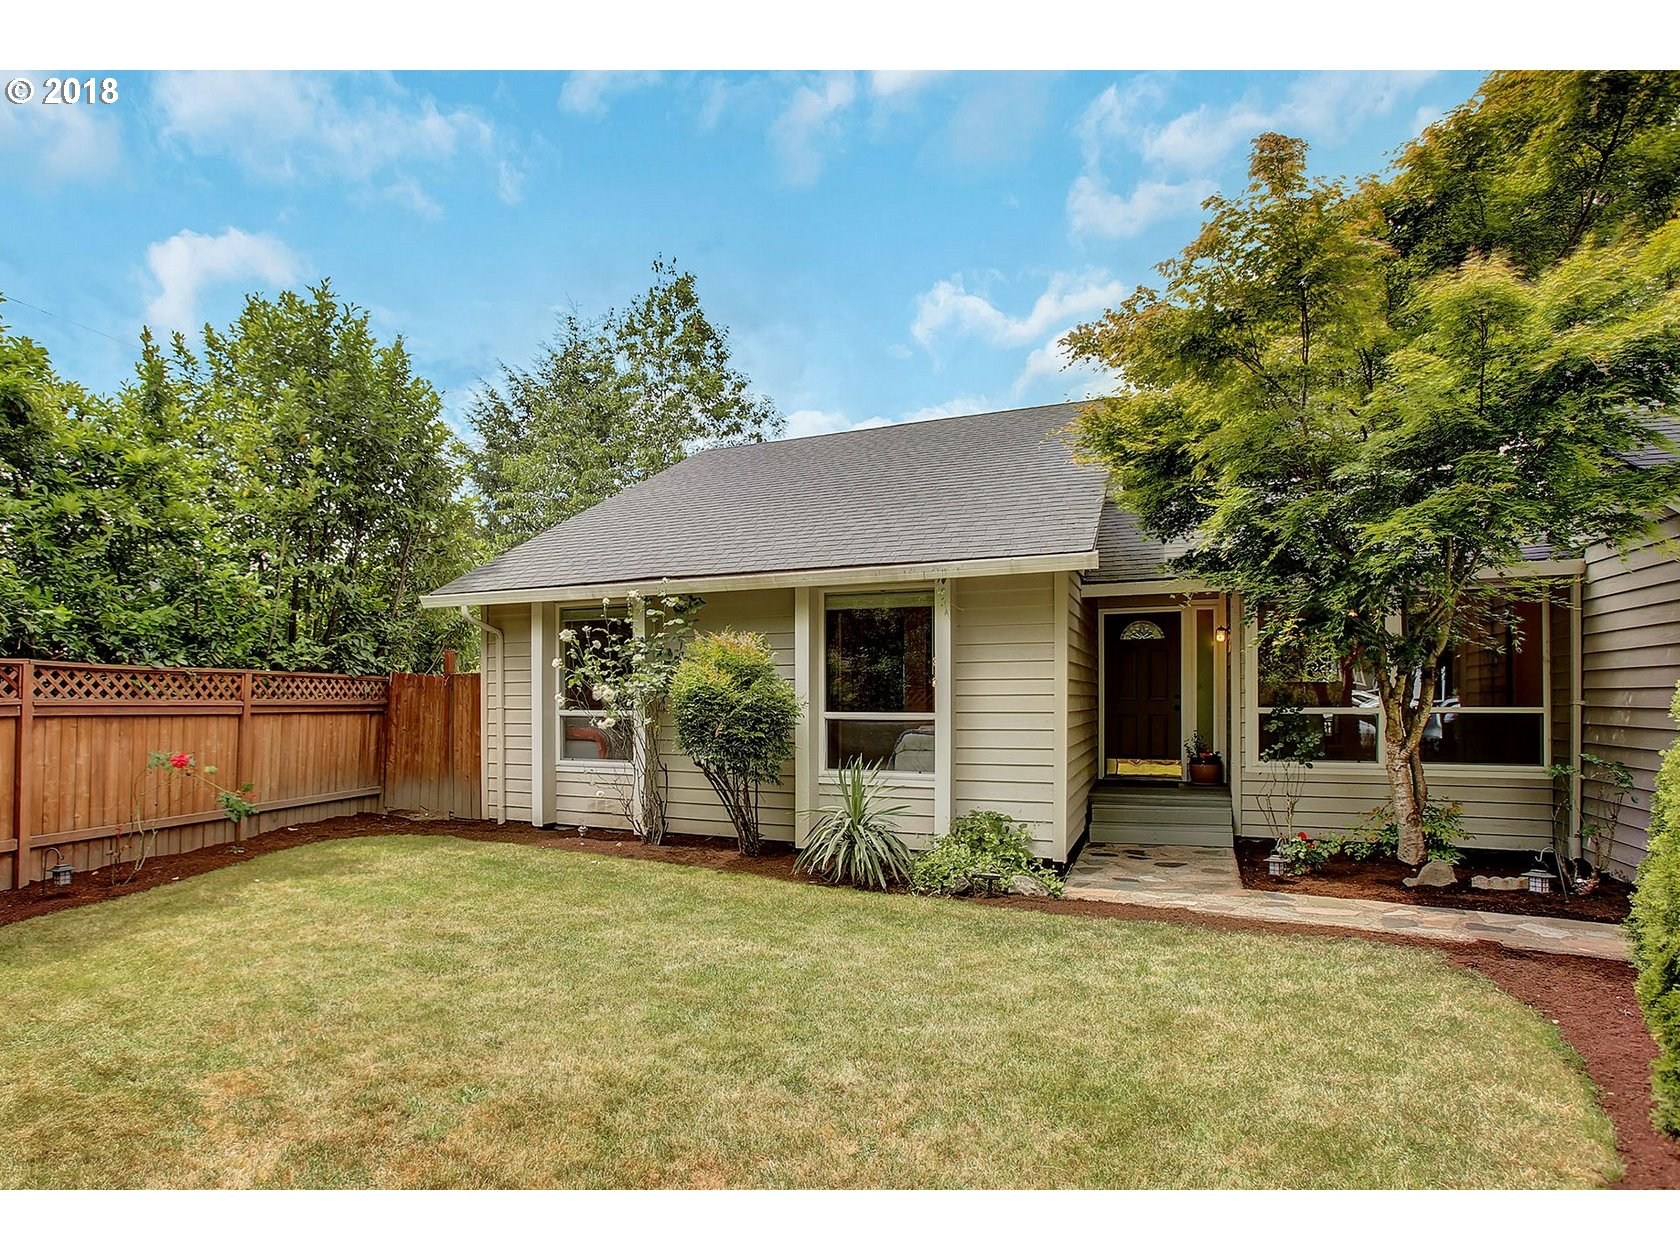 12545 SW BOONES FERRY RD, Portland, OR 97035